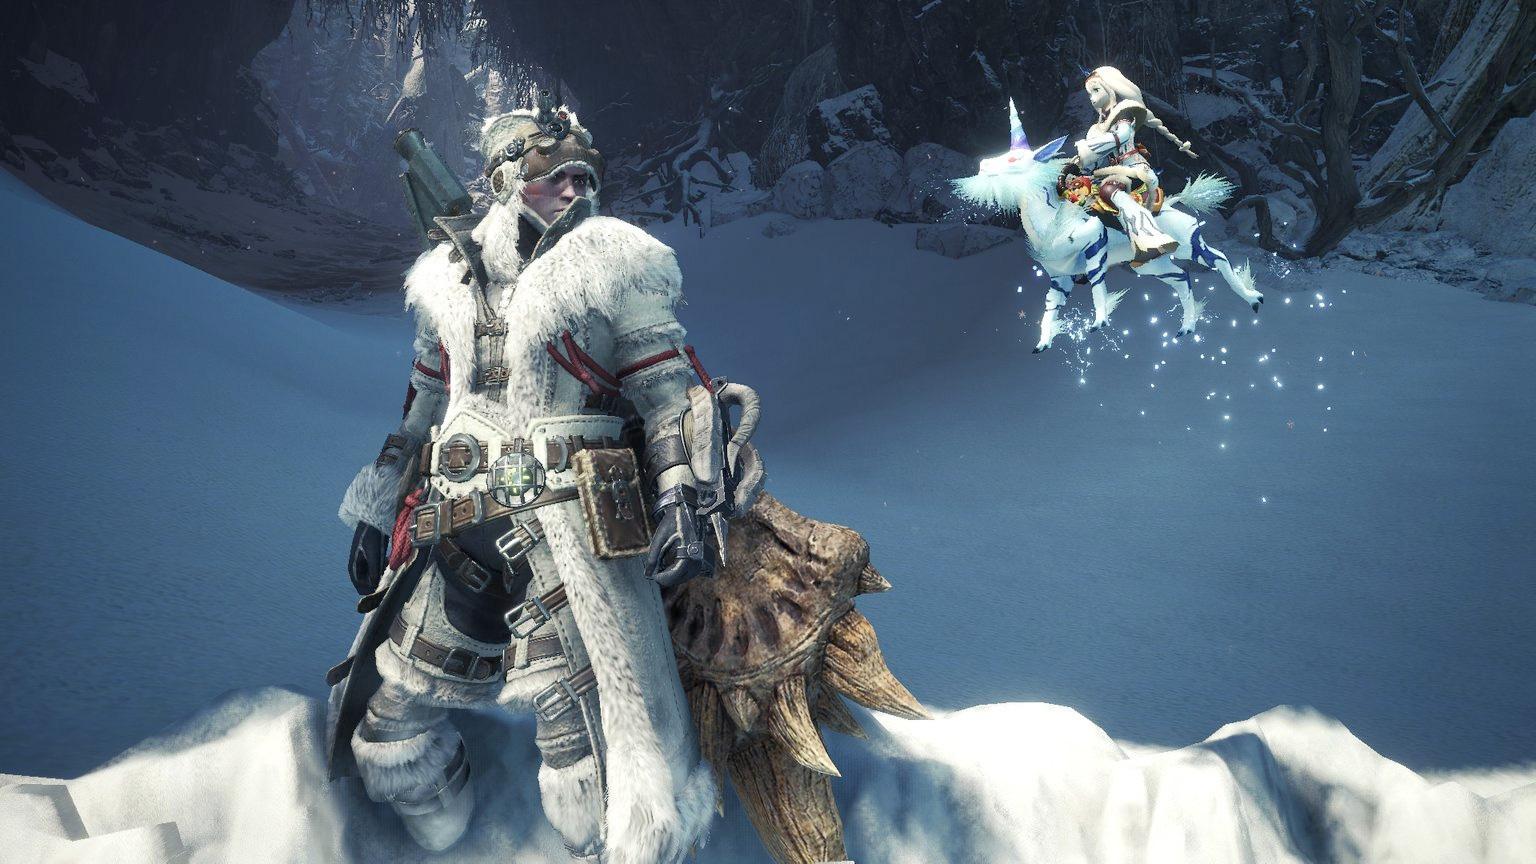 We can finally grab the Kirin Rider pendant in Monster Hunter World: Iceborne next week screenshot